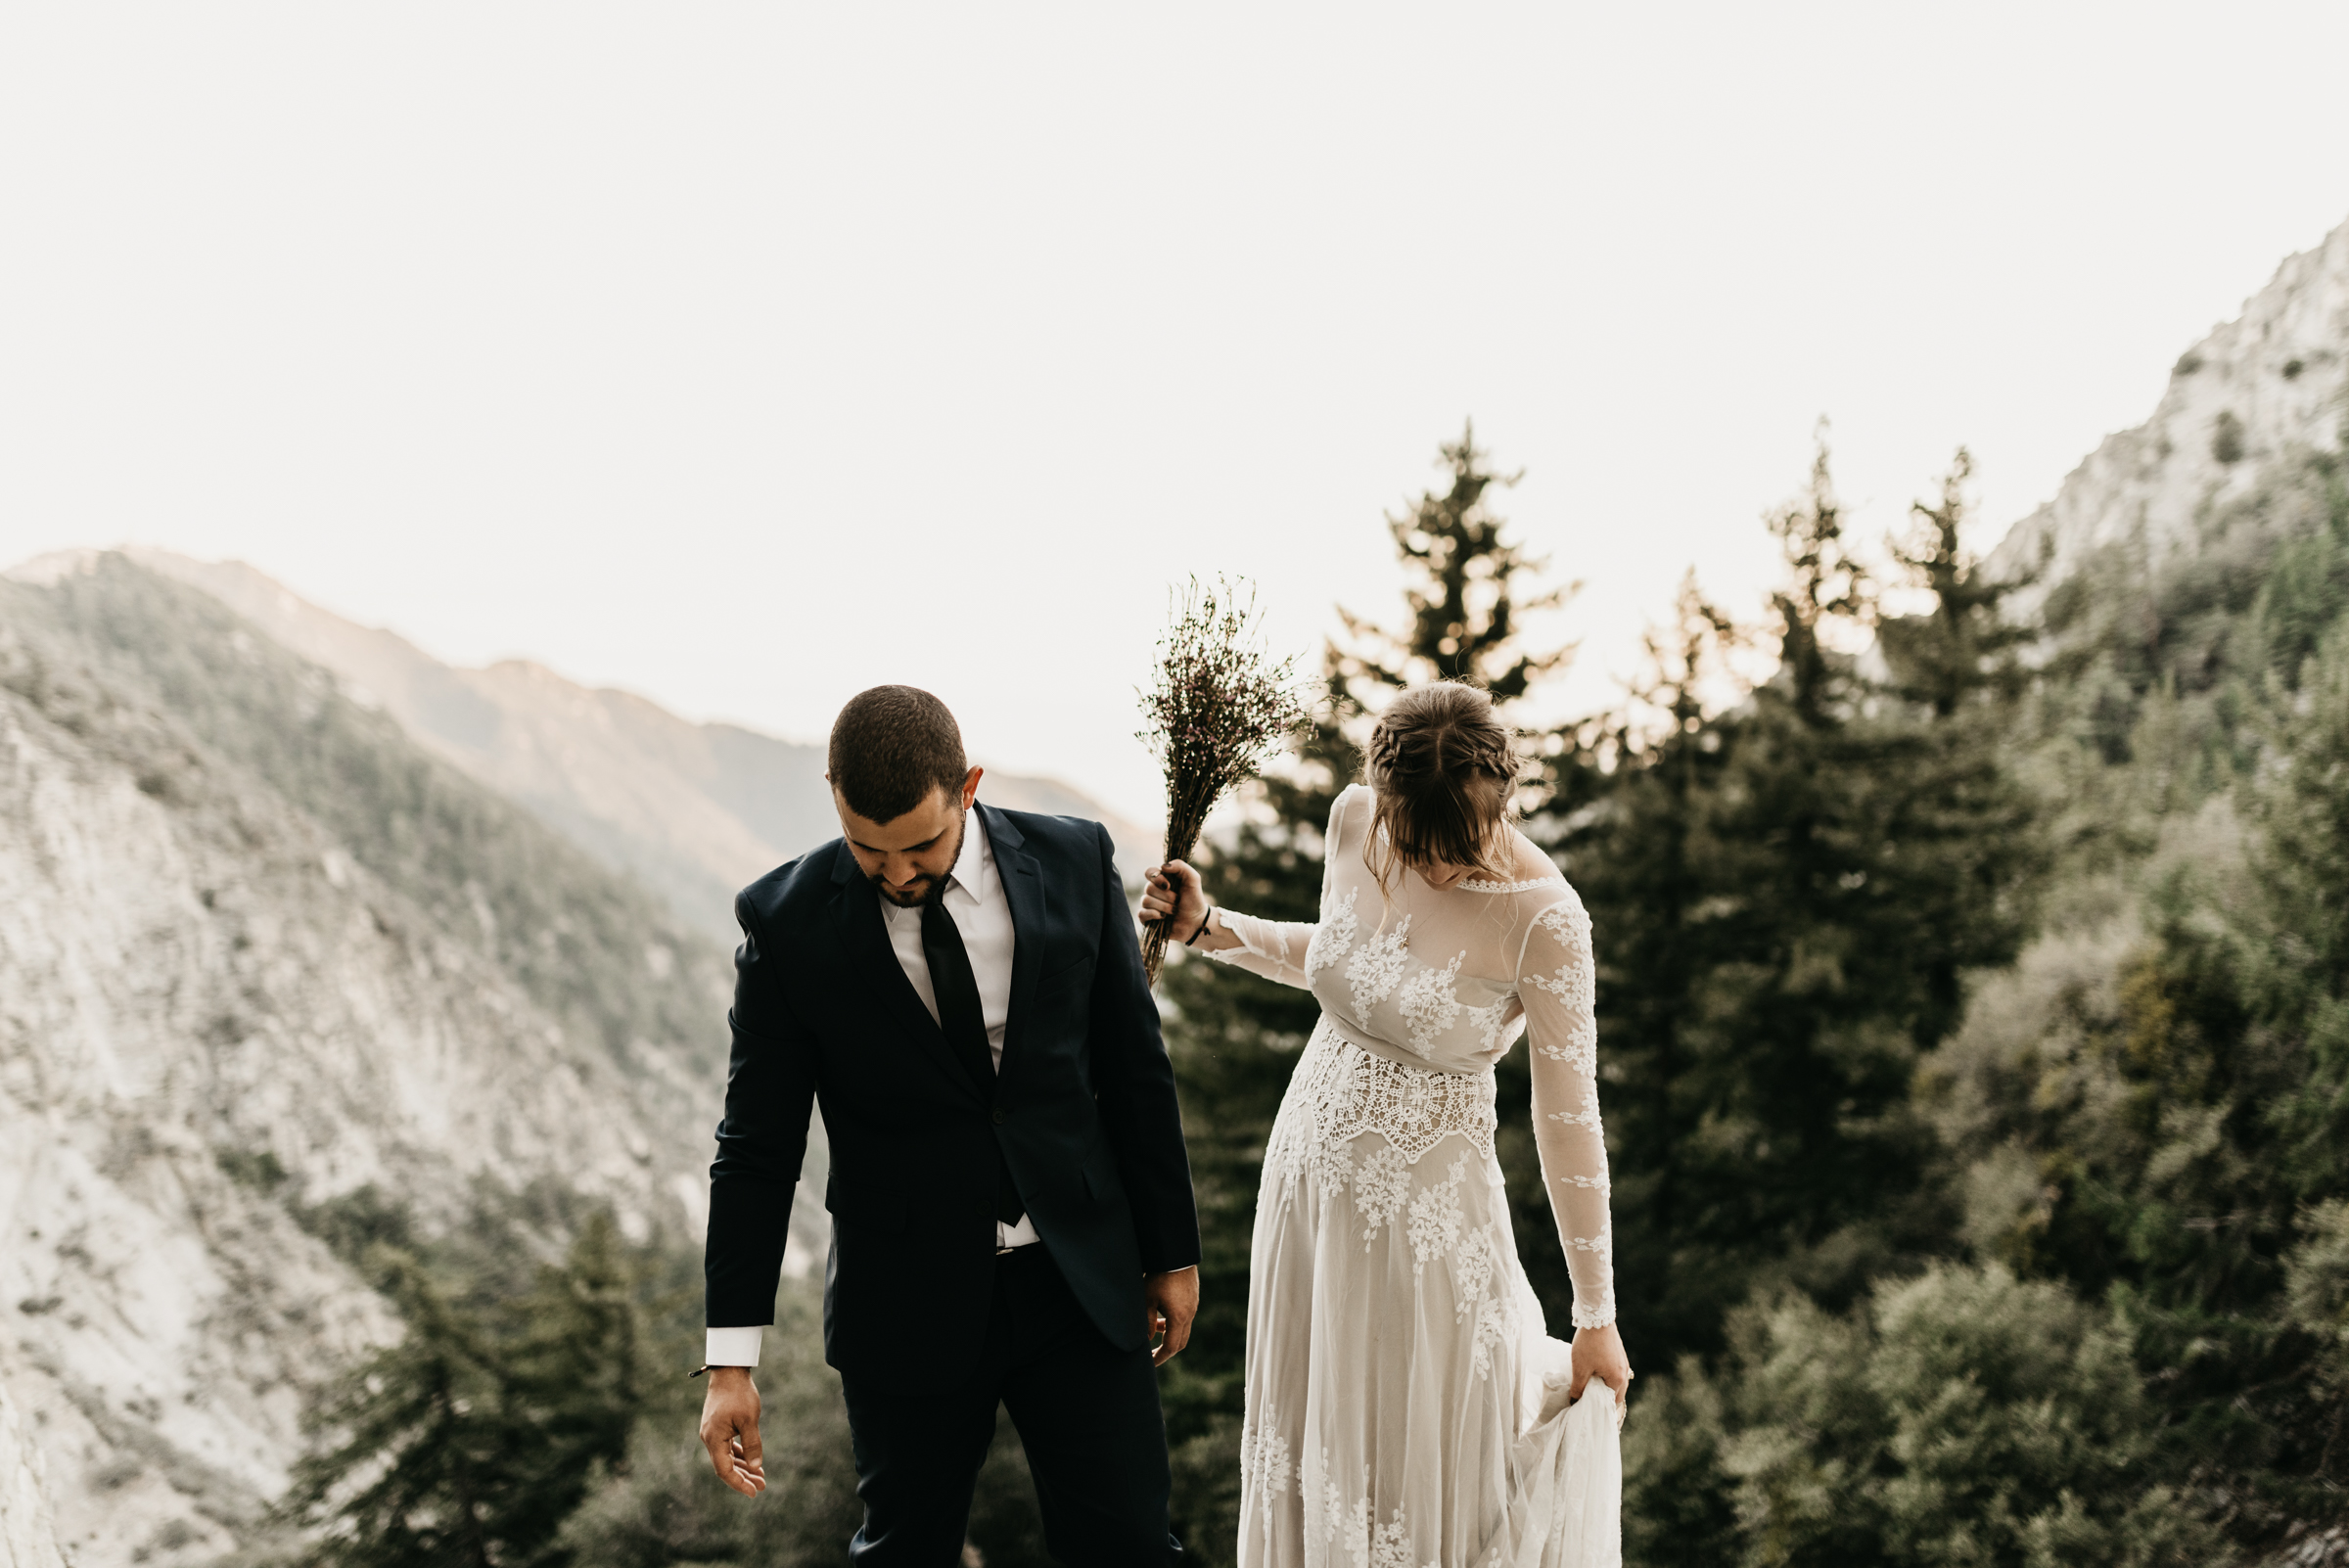 ©Isaiah + Taylor Photography - Los Angeles Wedding Photographers - Los Angeles Forest Wedding -86.jpg